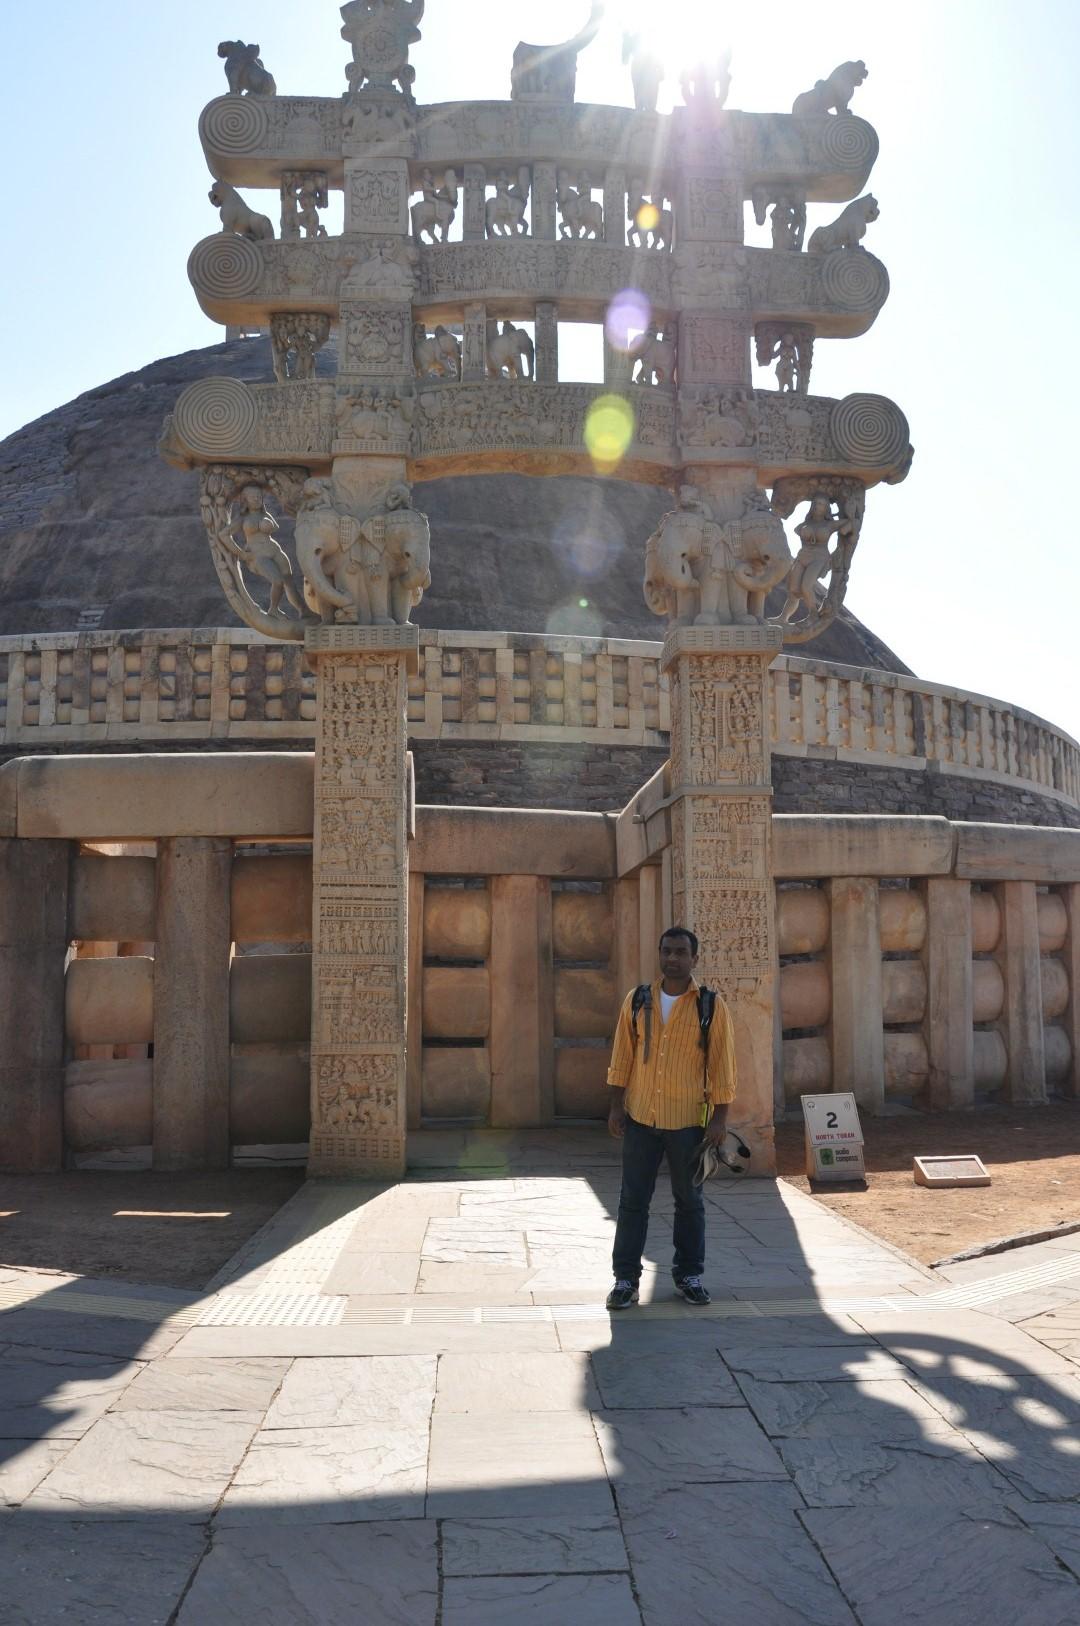 Essay on Sanchi Stupa : History, Architecture